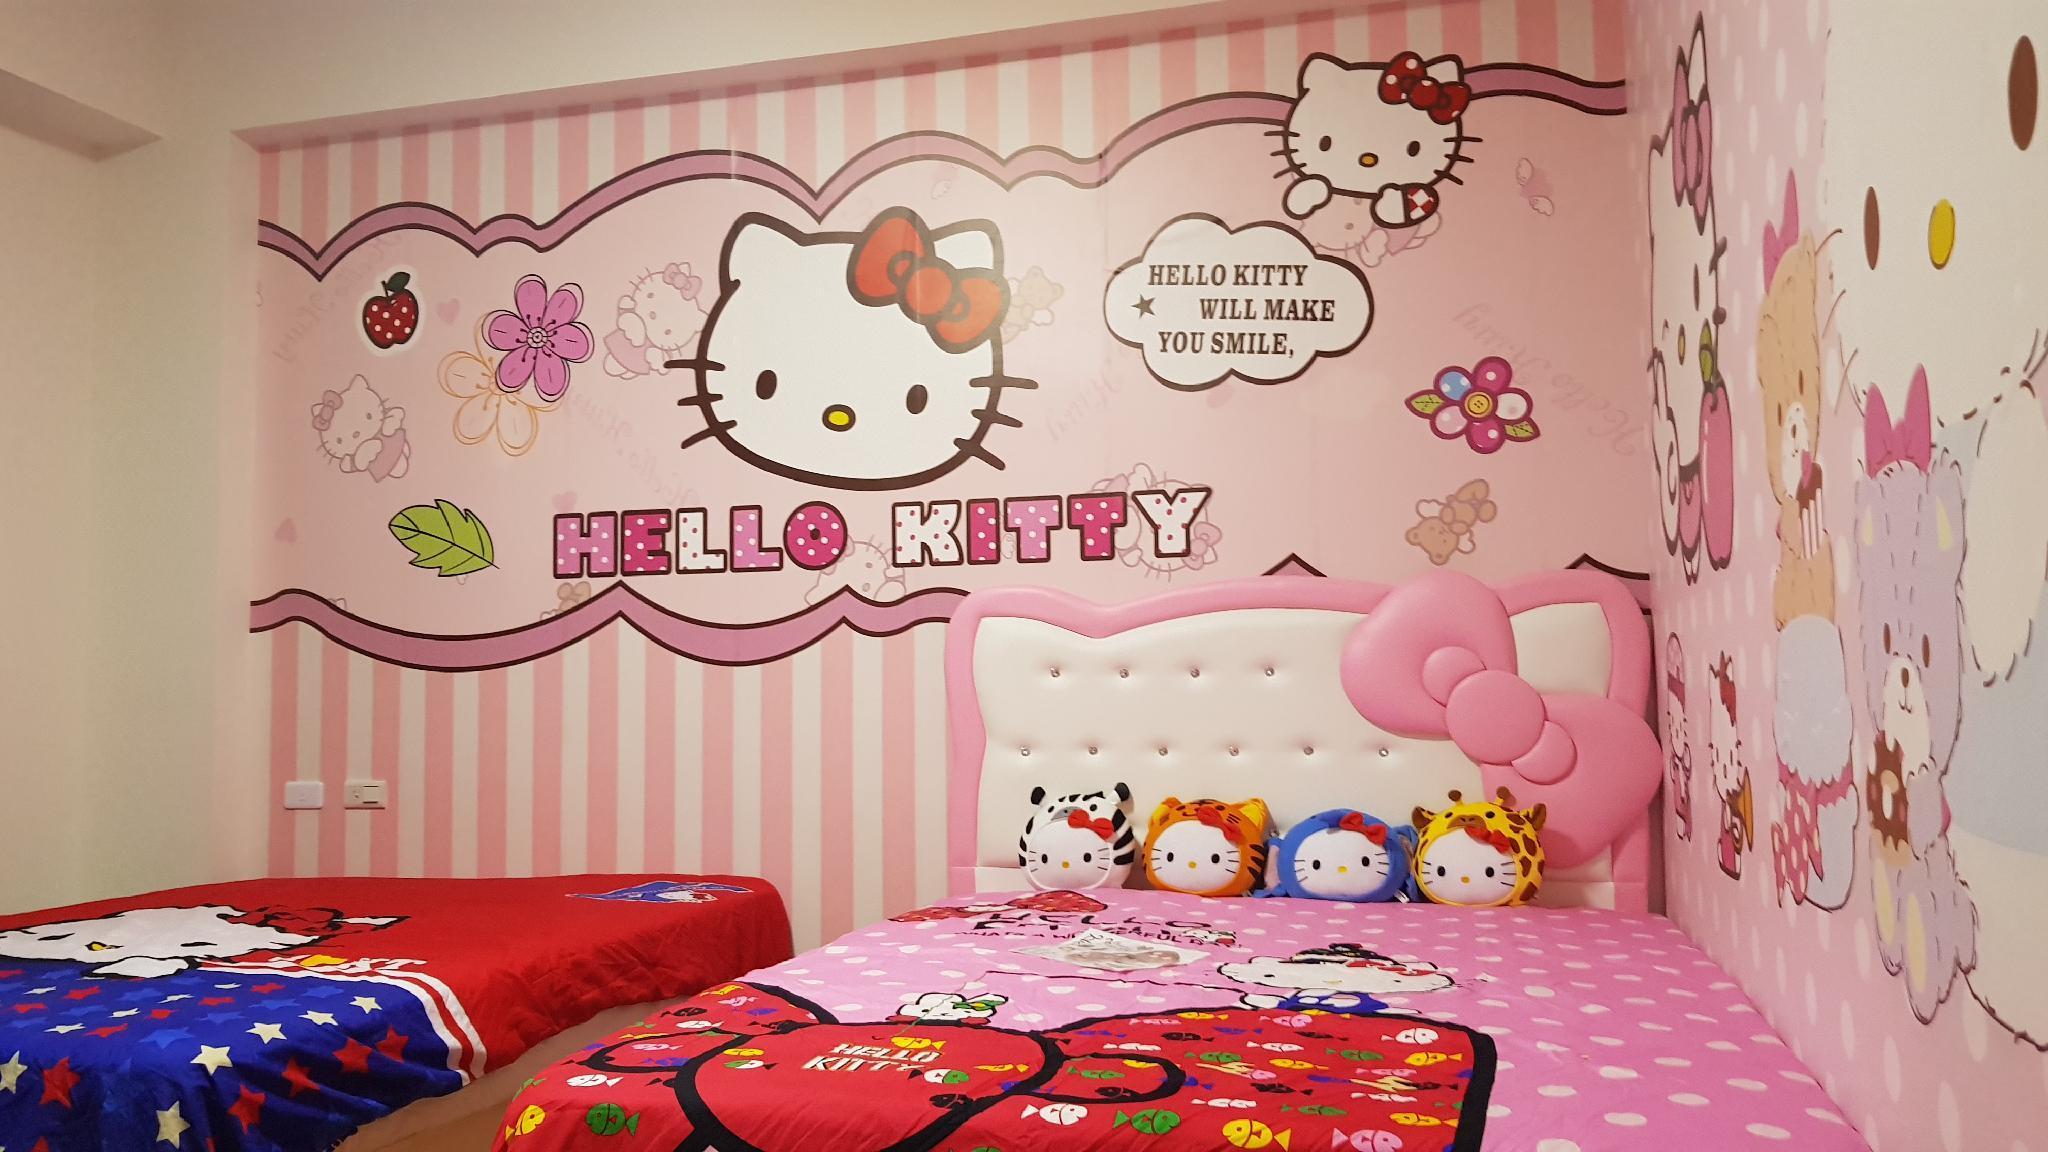 Wallpaper hello kitty untuk kamar